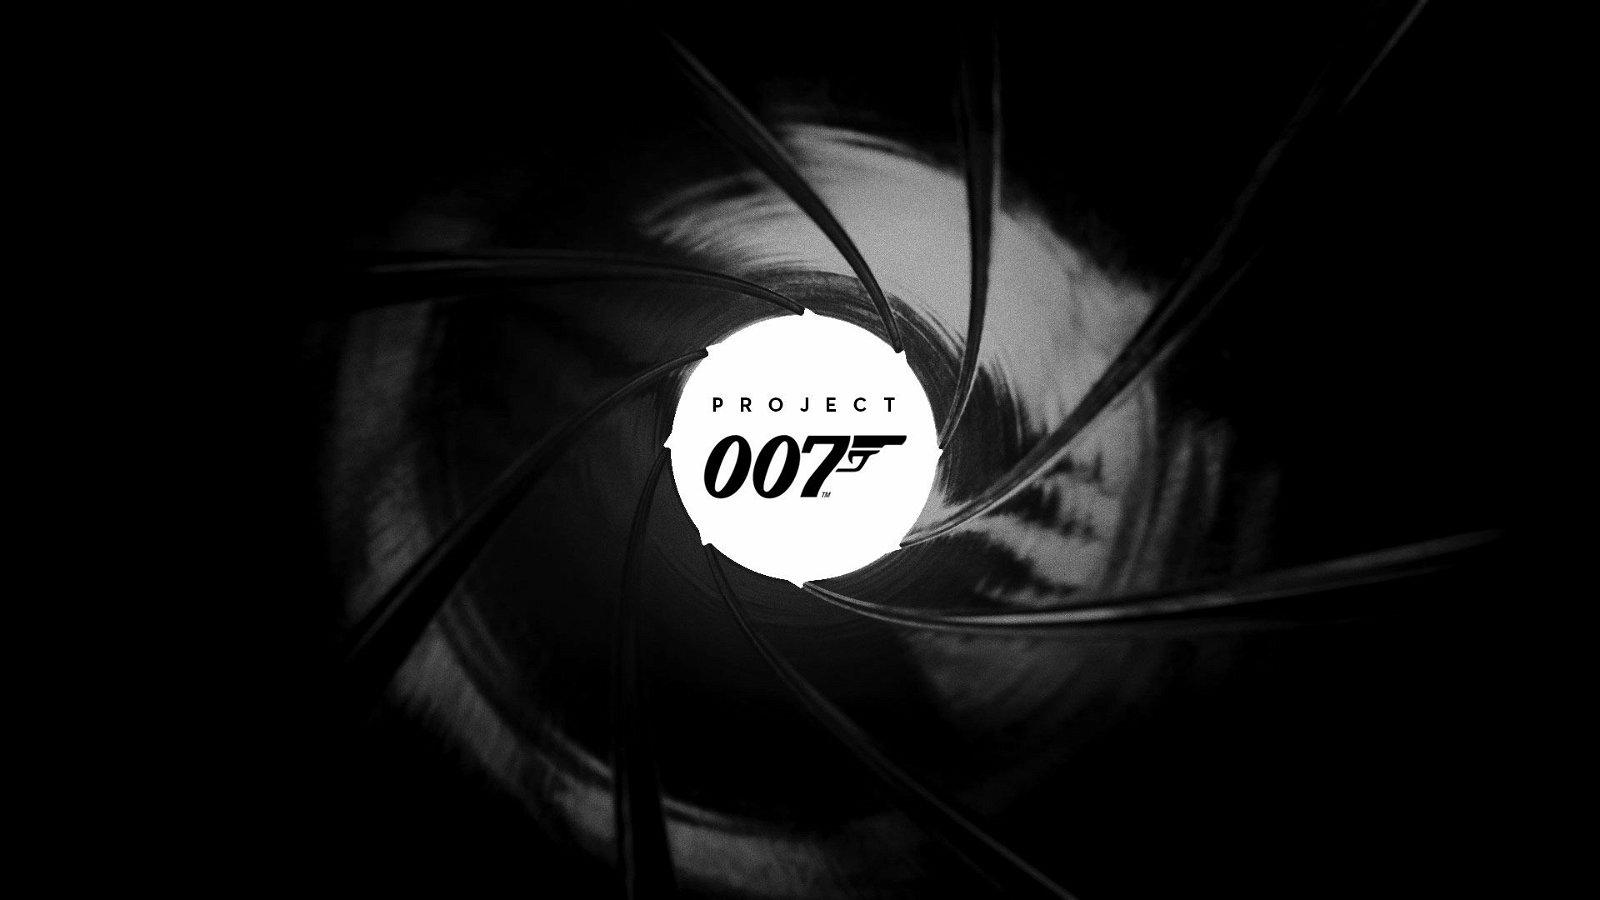 IO Interactive Announces Project 007